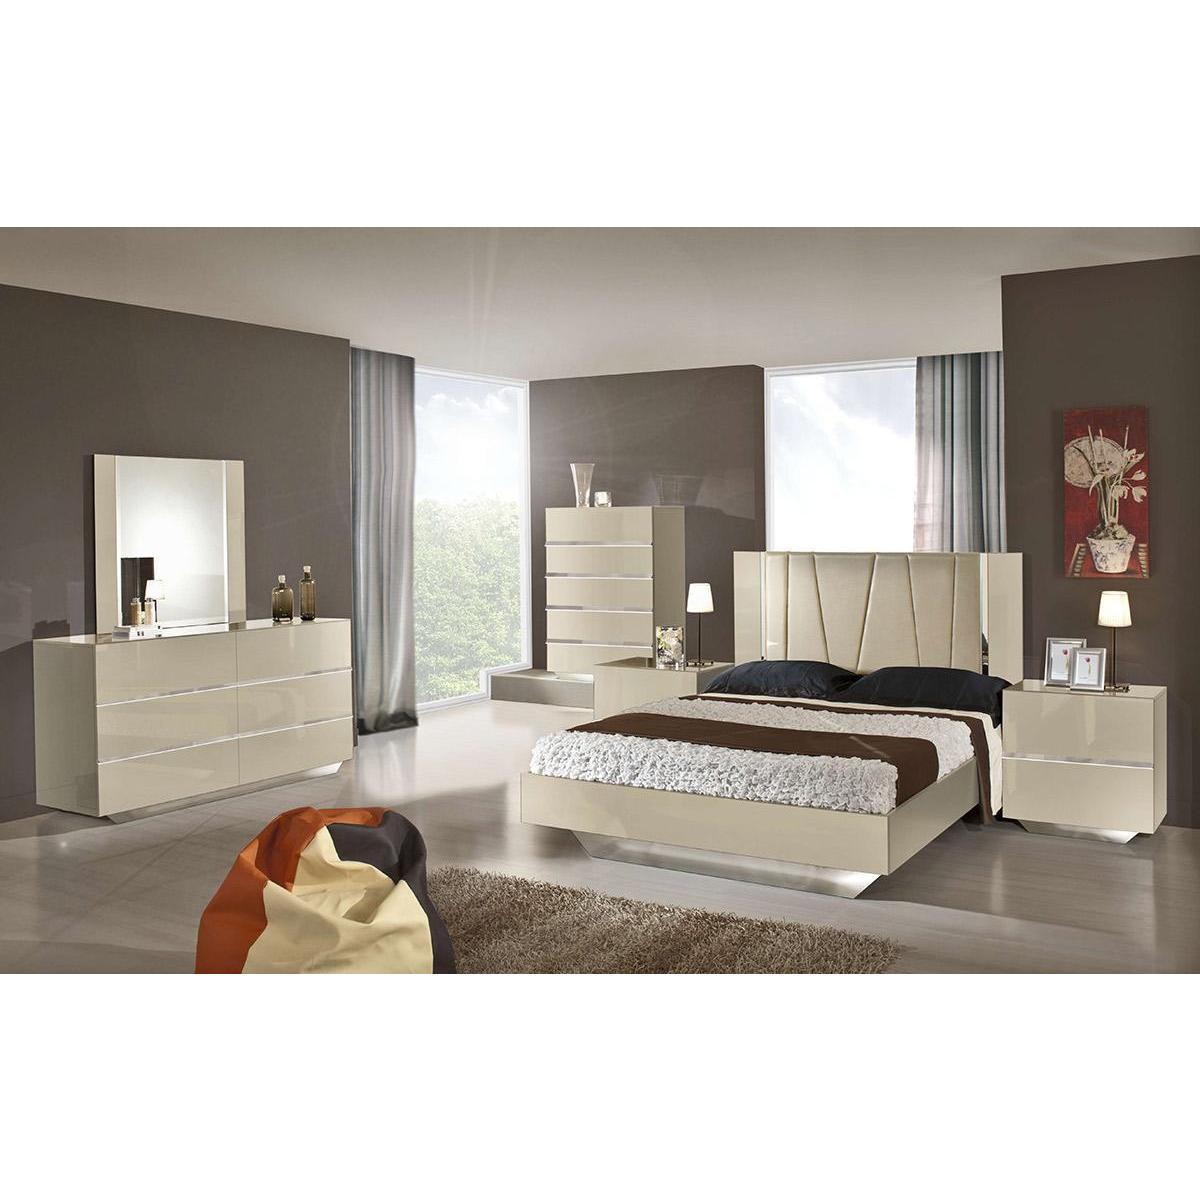 Shop Modrest Luxor Modern Beige Lacquer Italian Bedroom Set